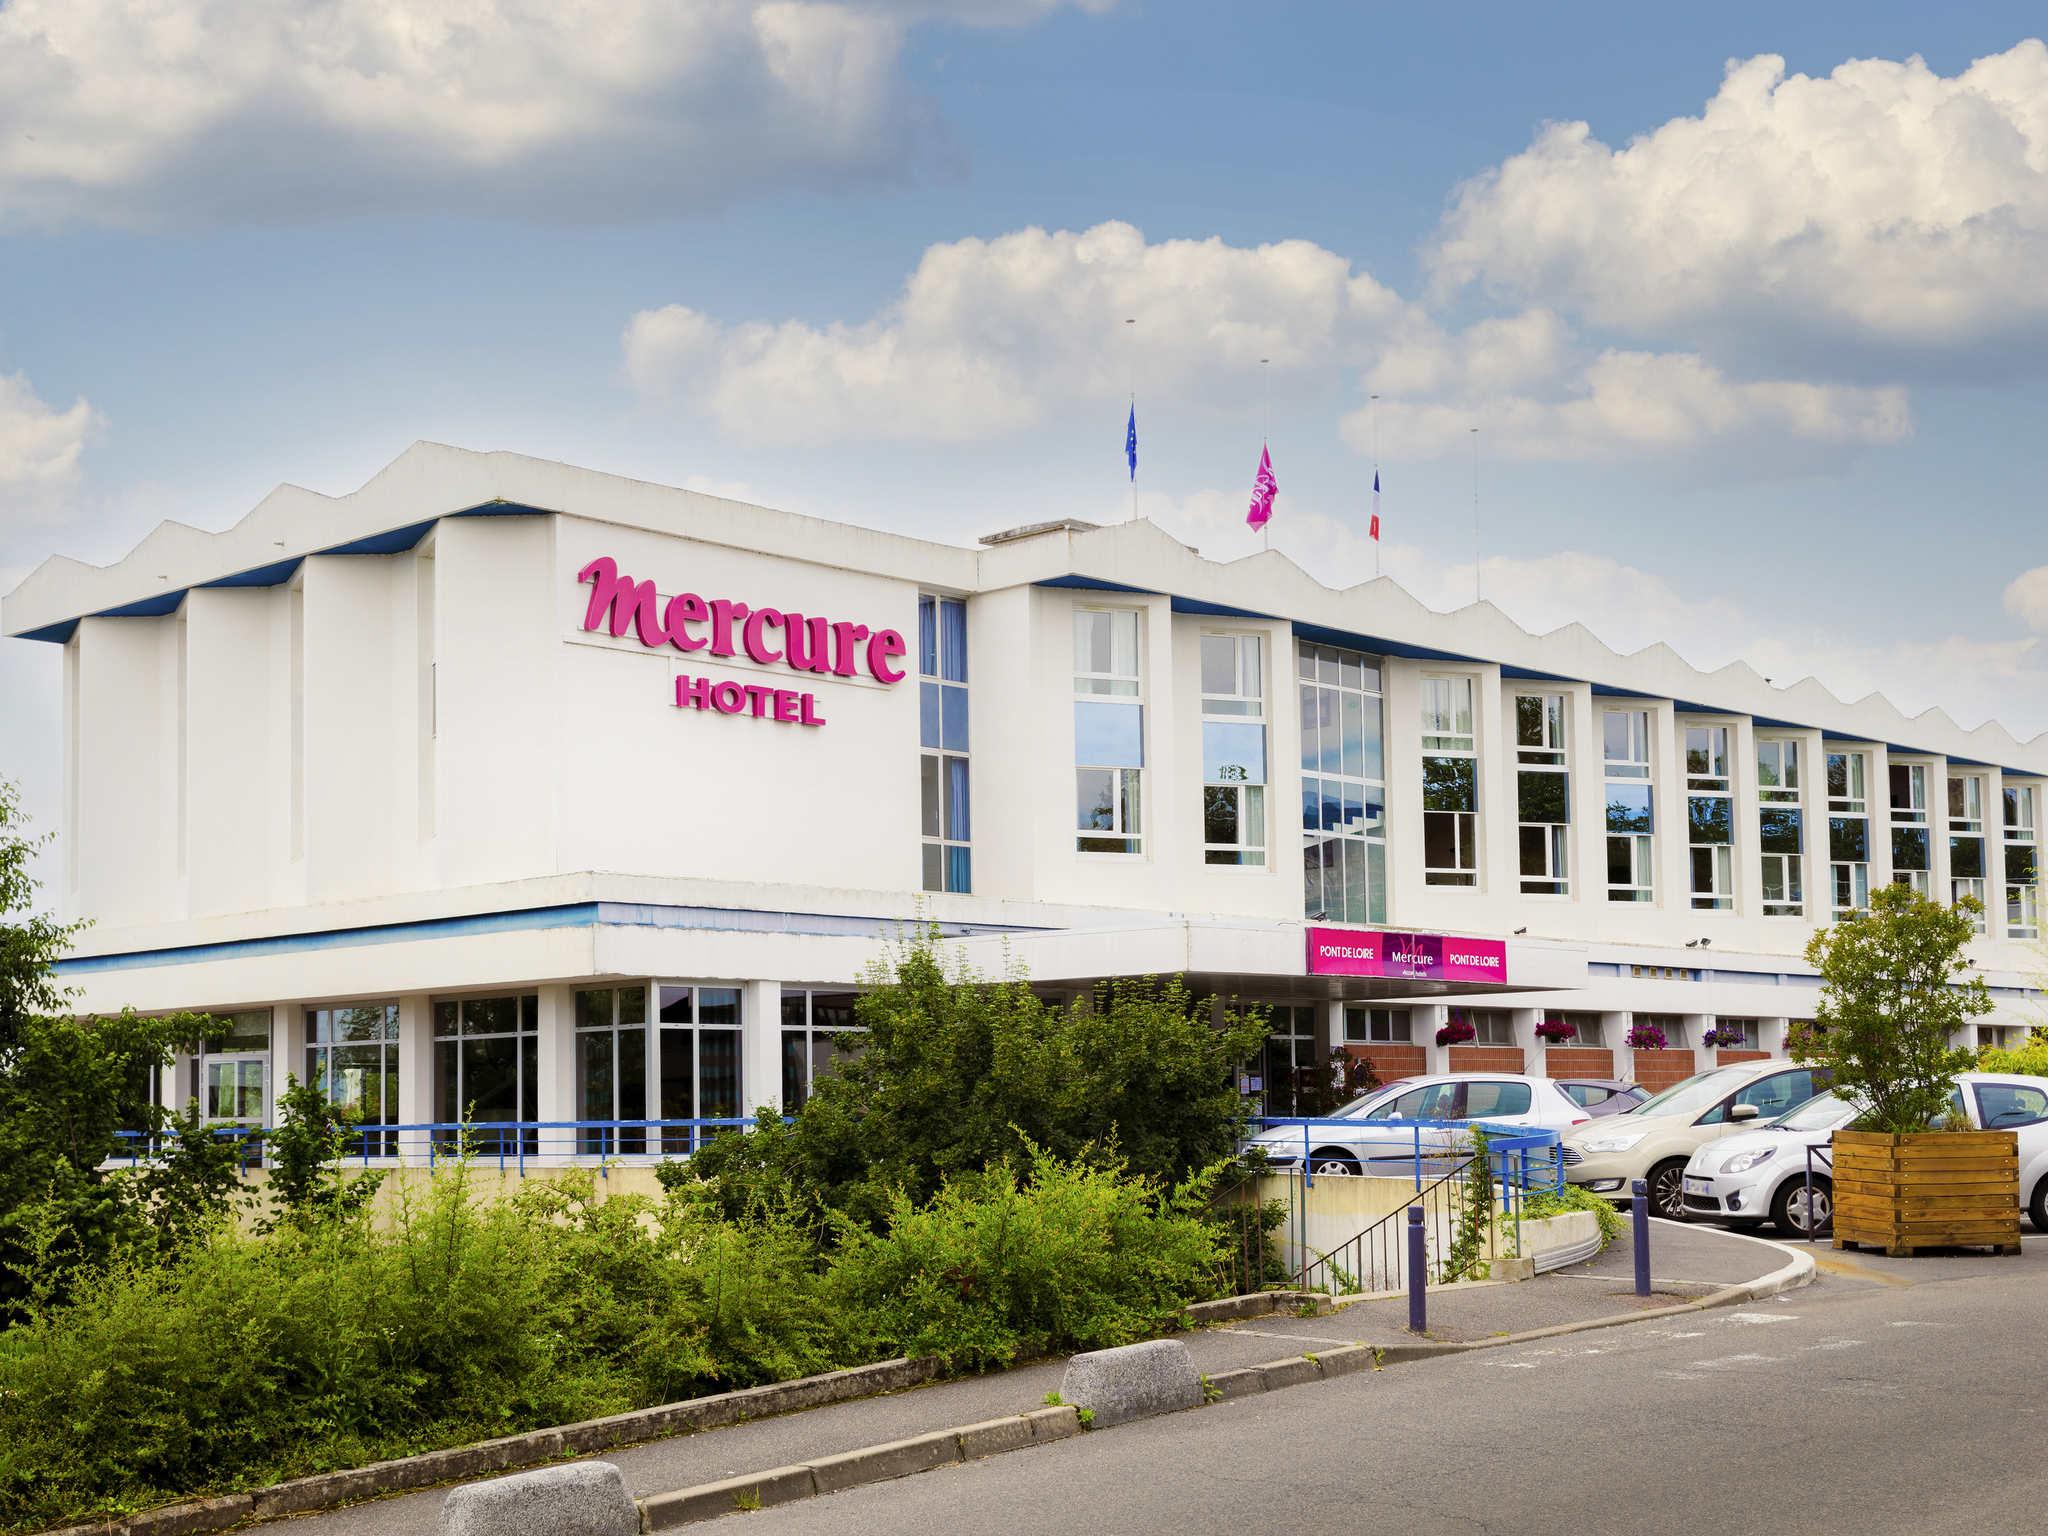 Hotel – Hotel Mercure Nevers Pont de Loire